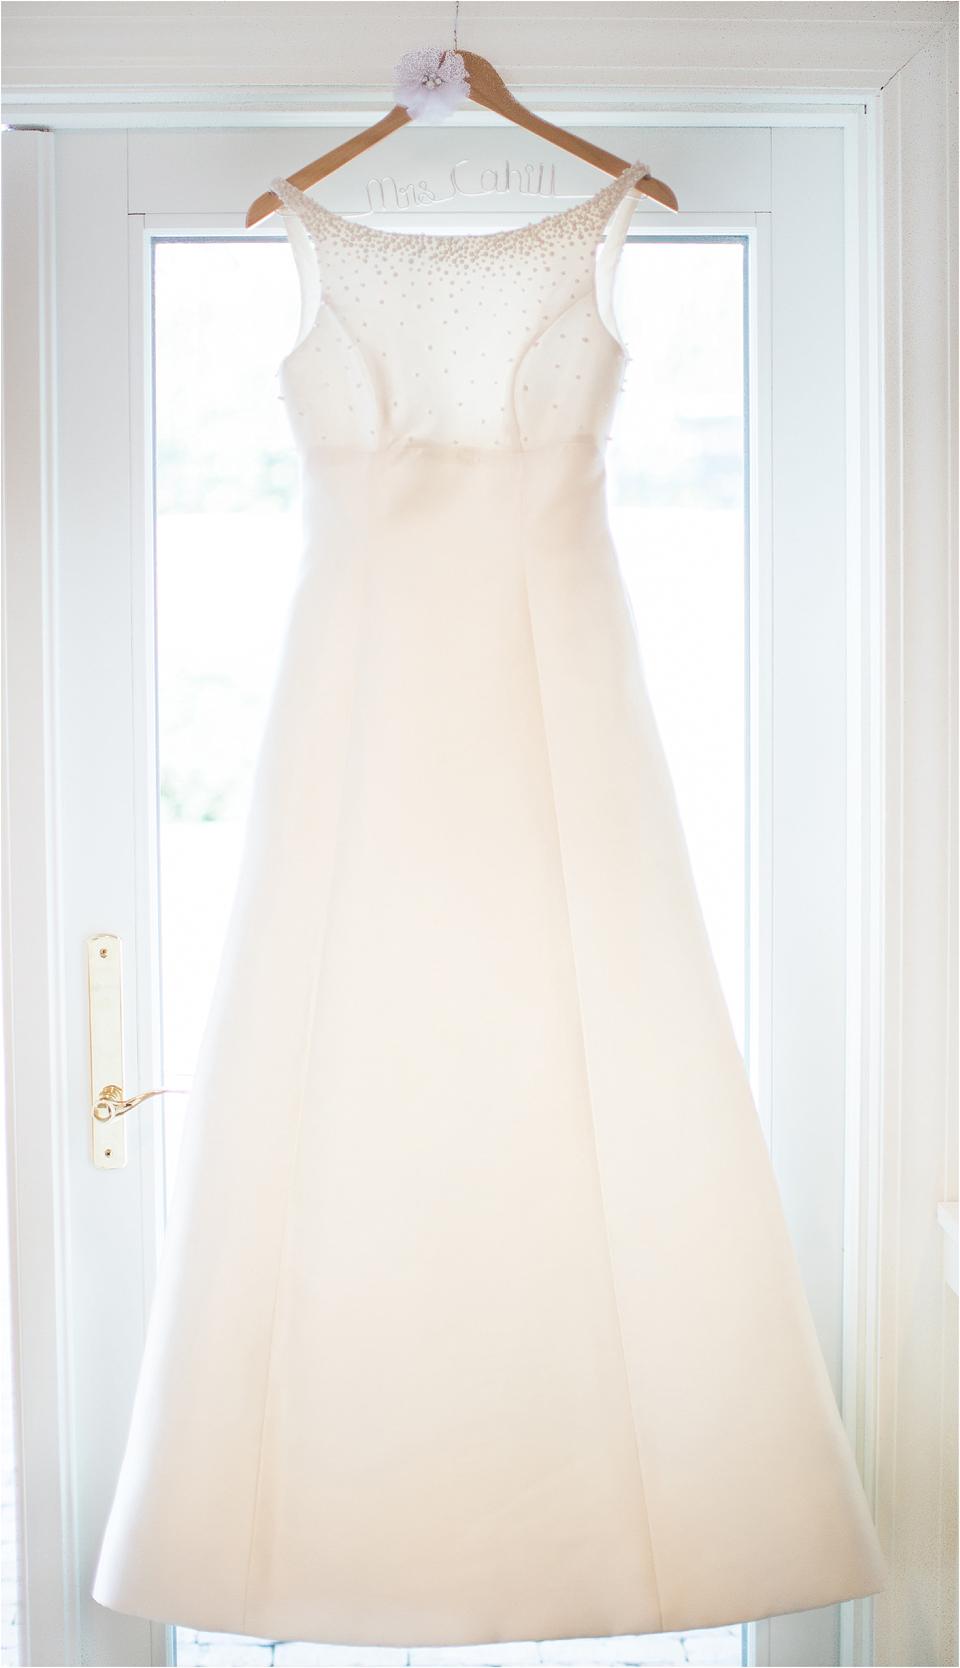 wequassett-boston-cape-cod-wedding-photographer-photo-47